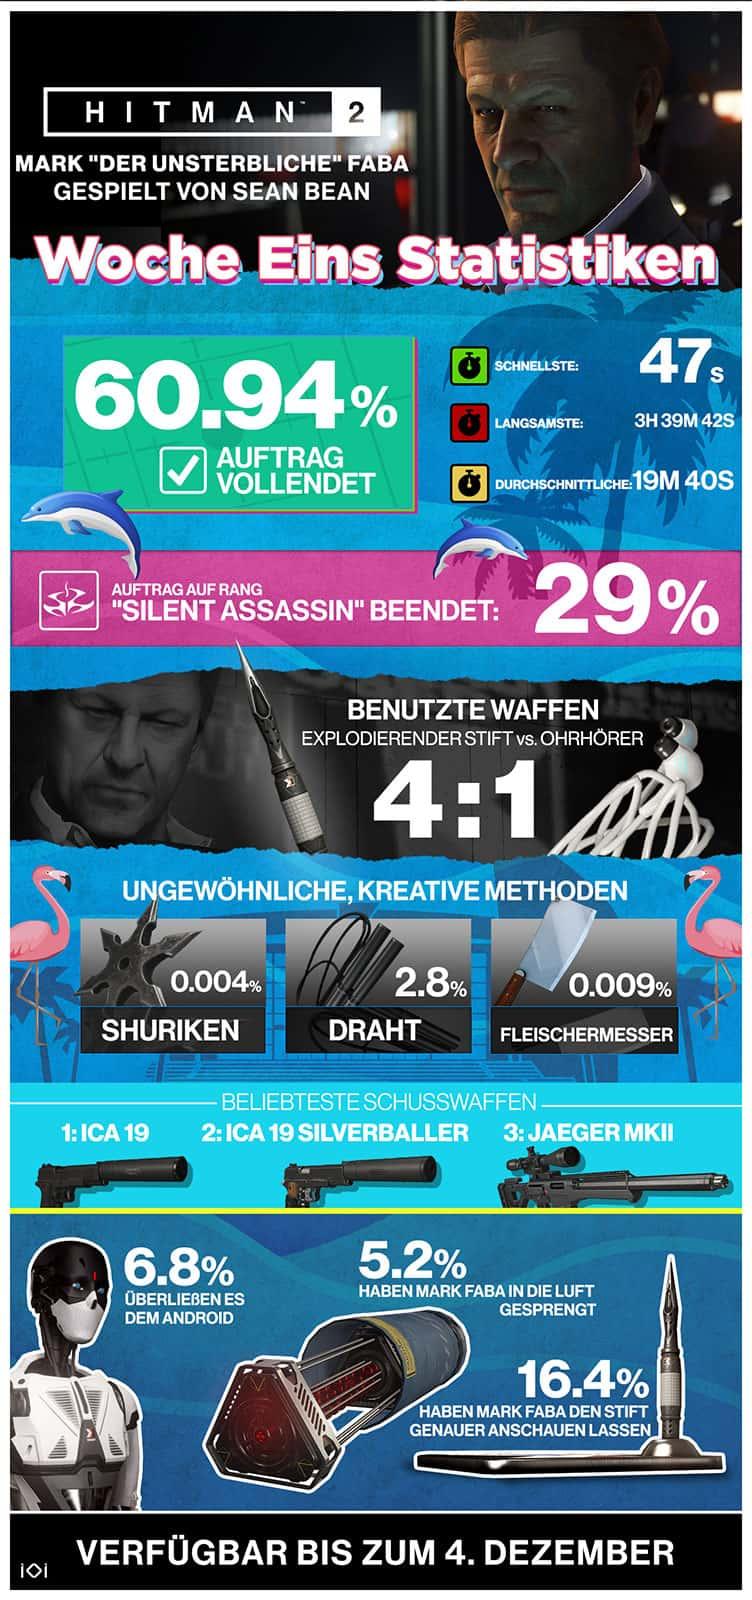 Hitman 2: Sean Bean Infographic